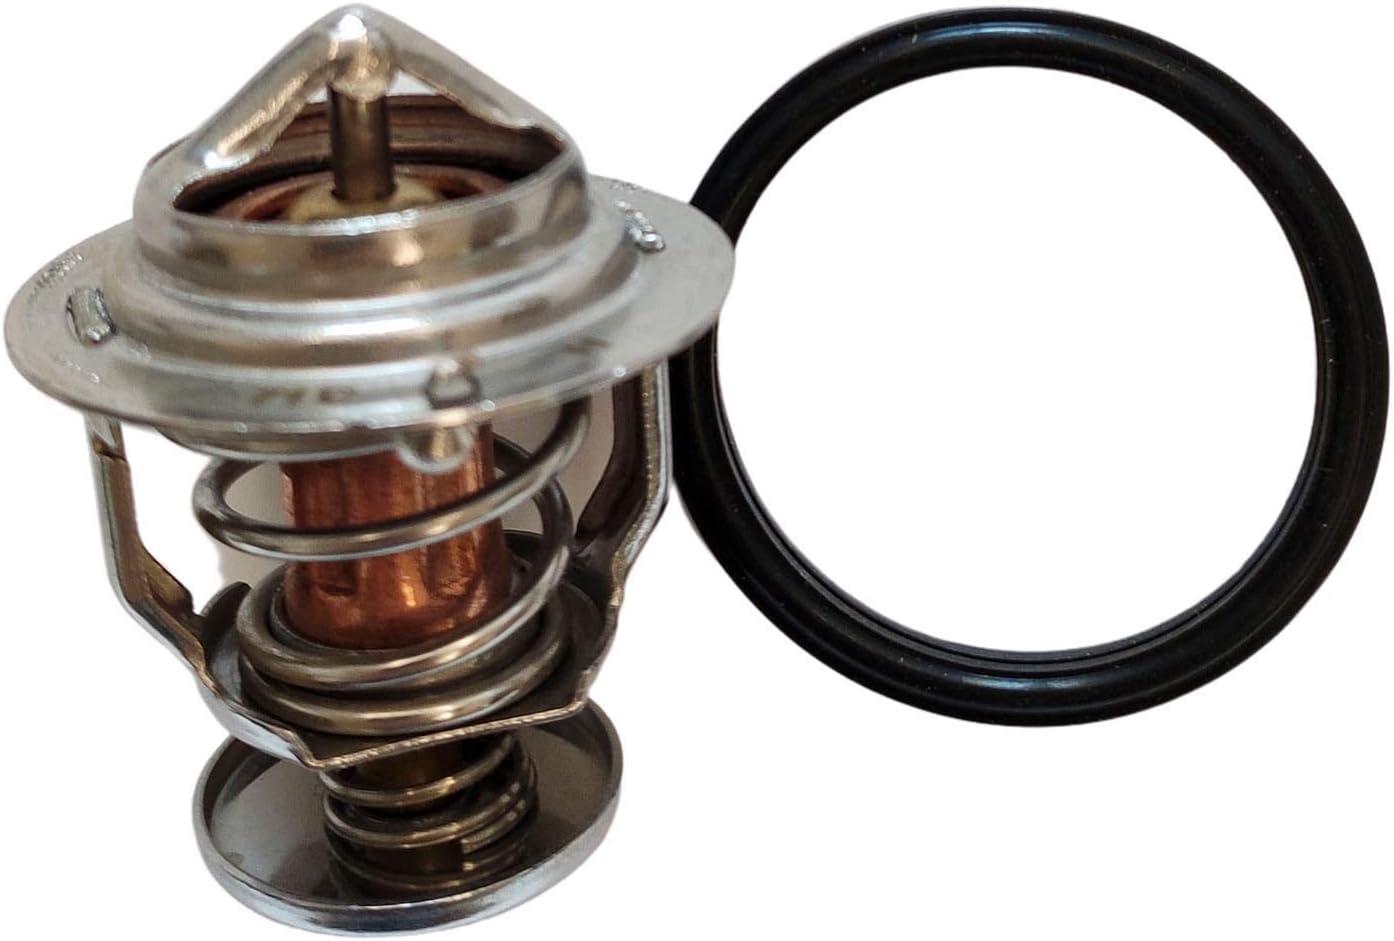 KRRK-parts Thermostat 129155-49800 fits for Komatsu Case Kobelco with Yanmar 3TNE84 3TNE88 3TNA72 3TNE78A 4TNE84 4TNE88 Engine